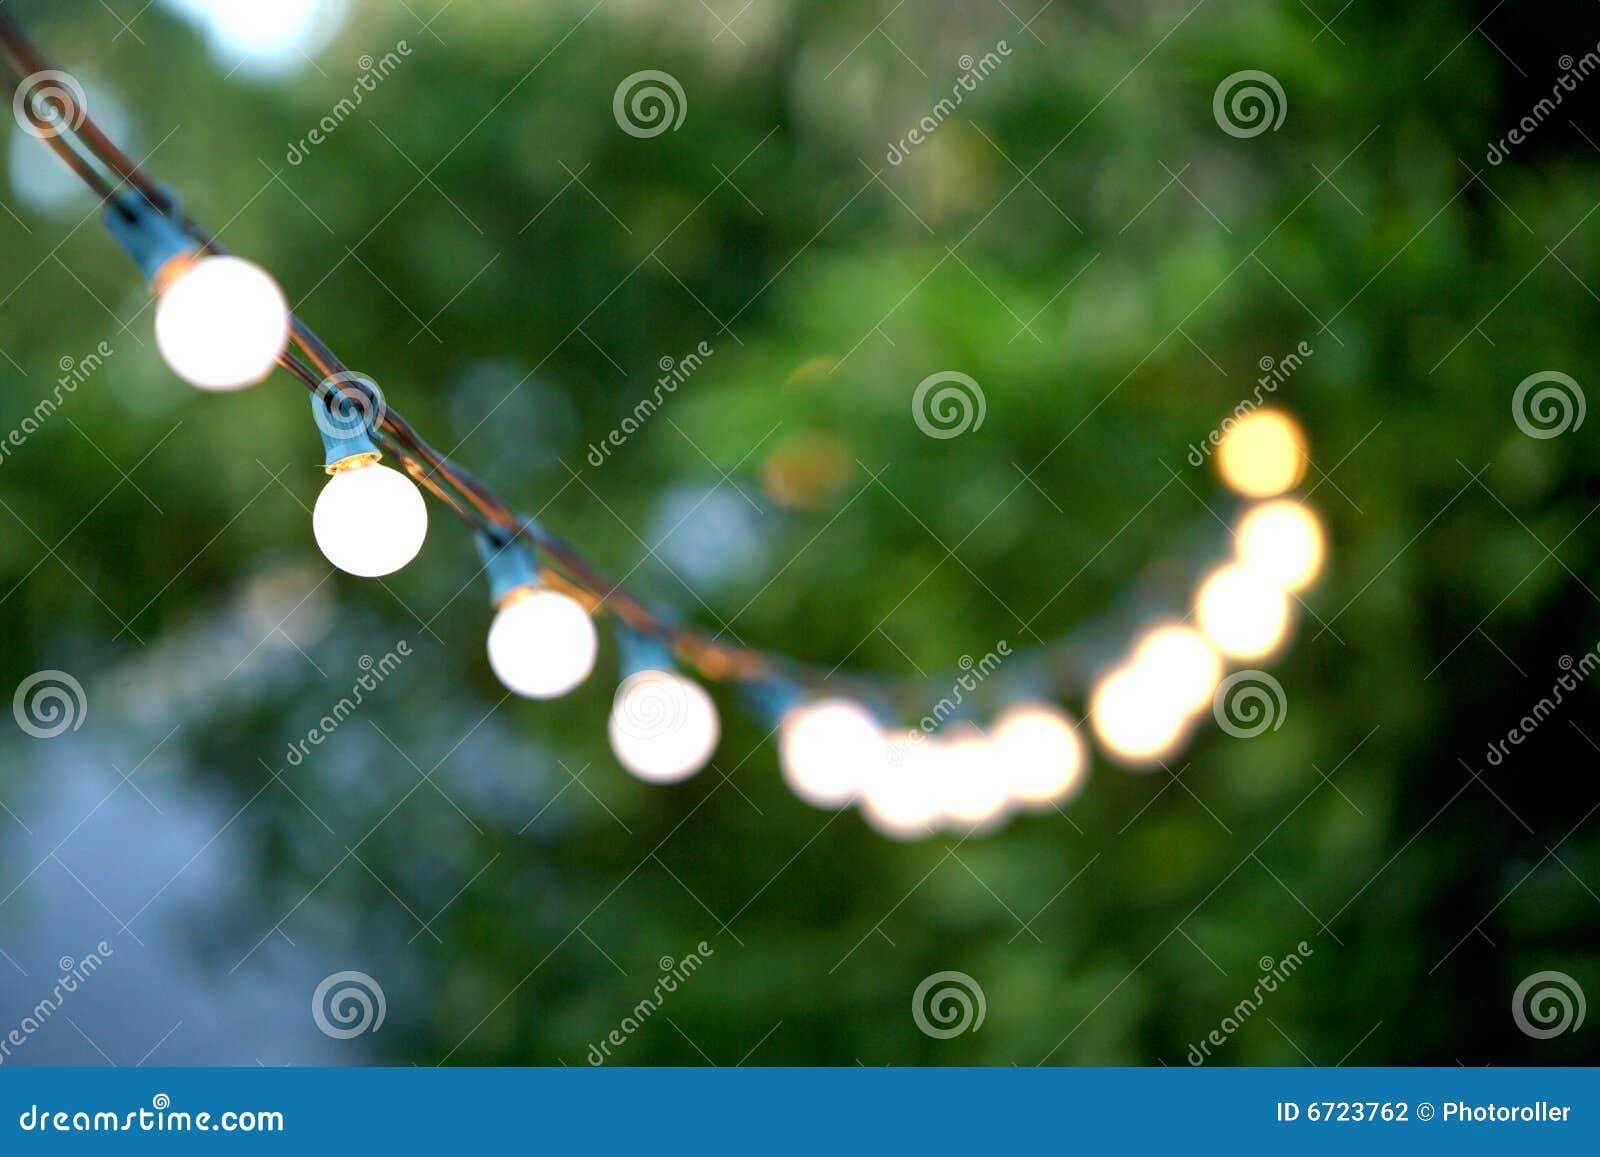 Luces de la navidad decorativas colgantes foto de archivo for Luces decorativas jardin